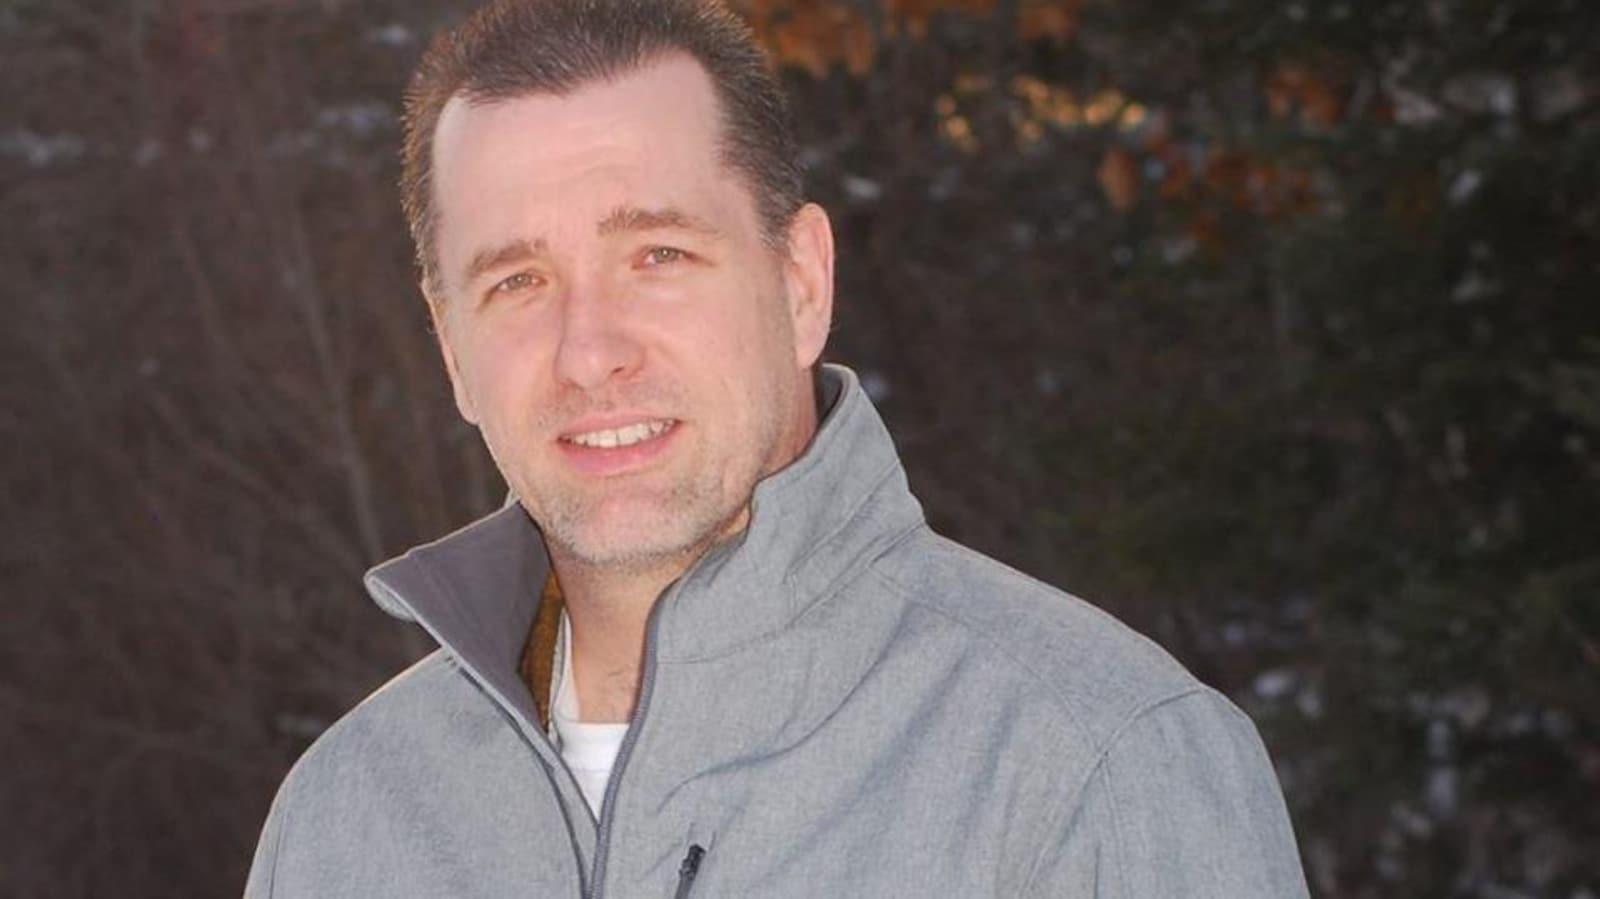 Paul McColeman